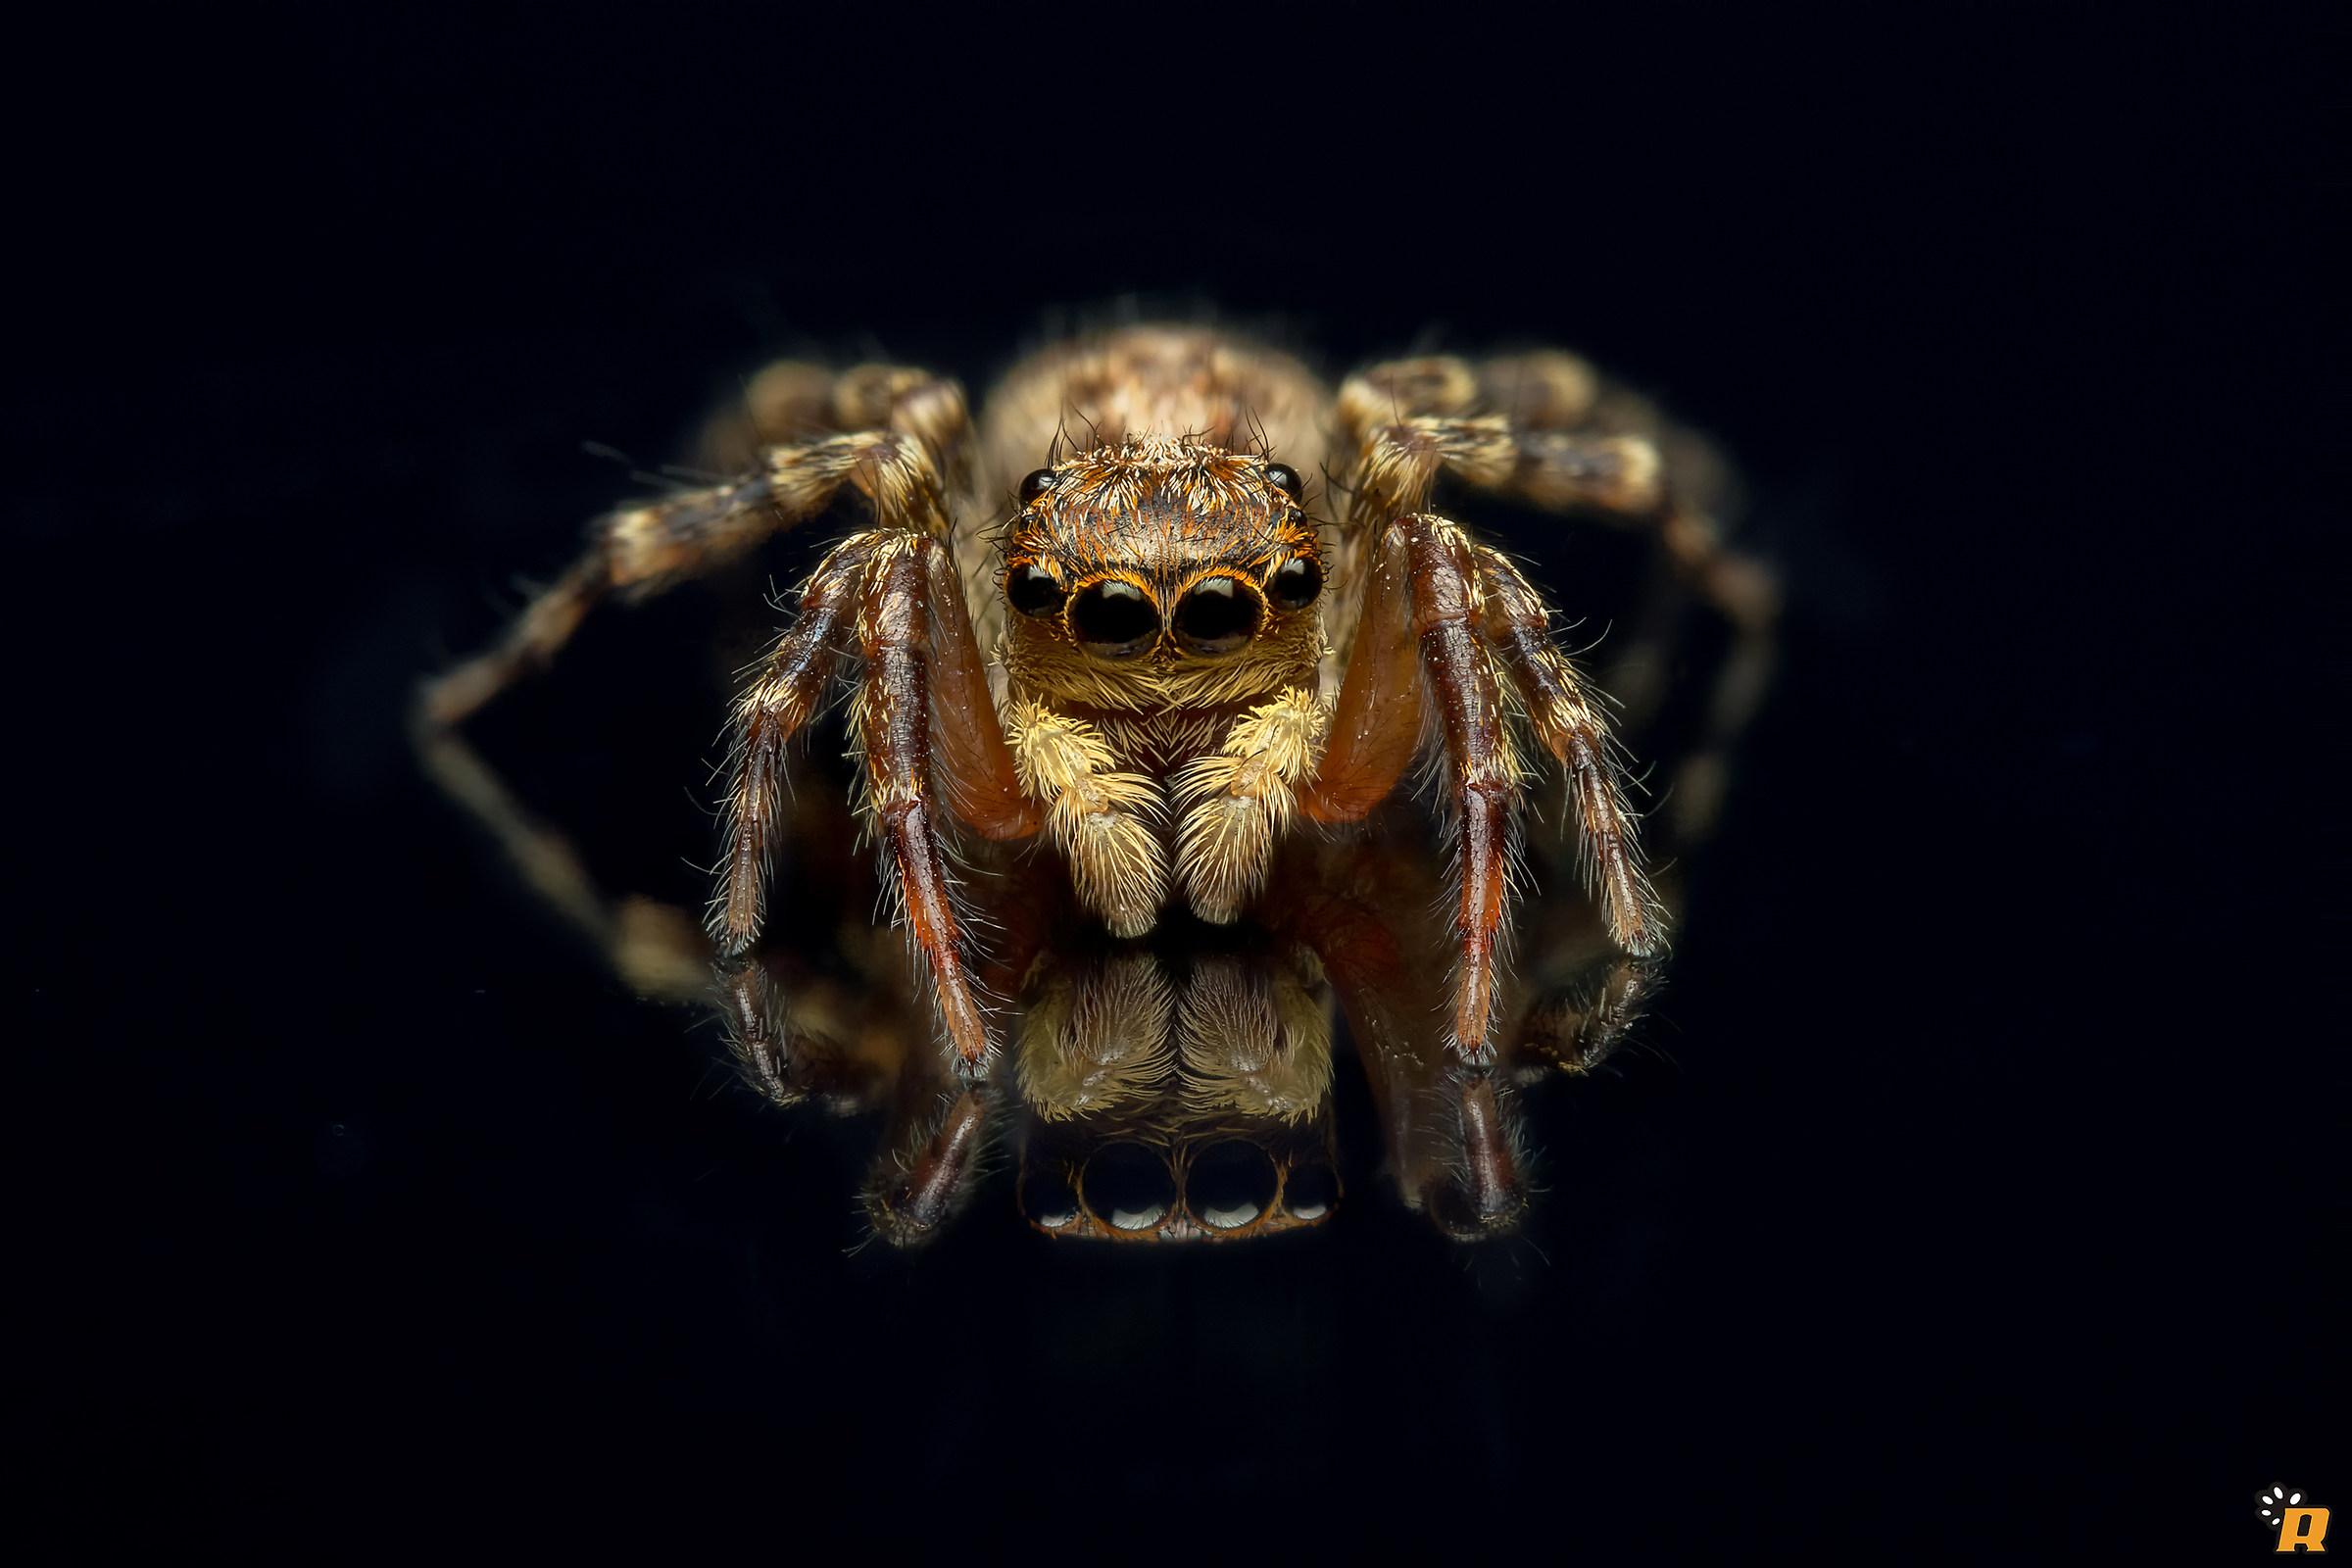 Vanity spider...